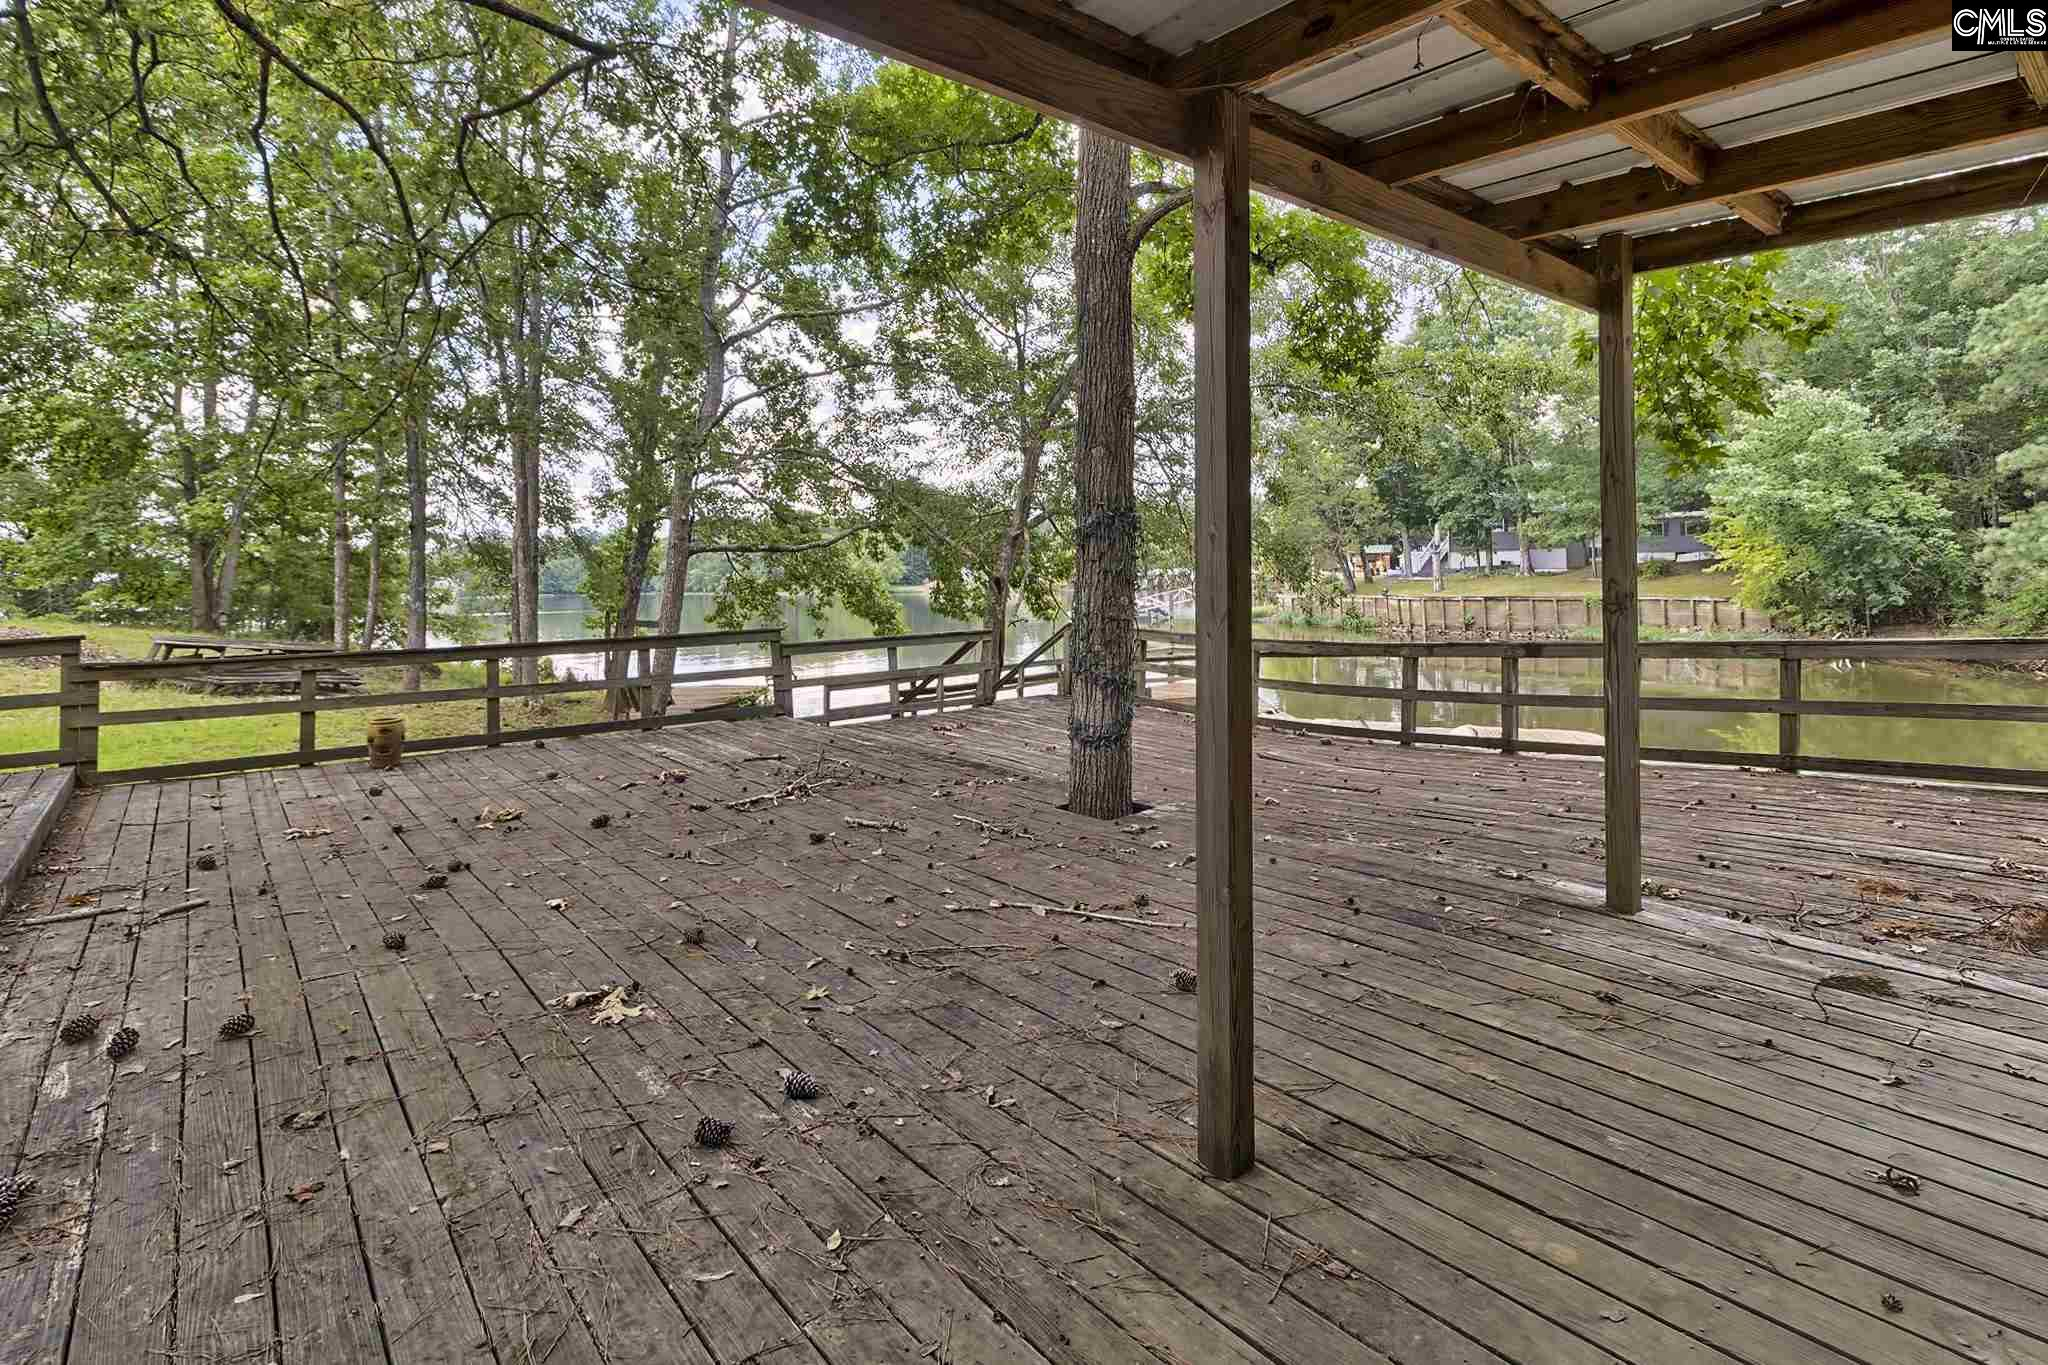 253 Cedar Point Winnsboro, SC 29180-8626